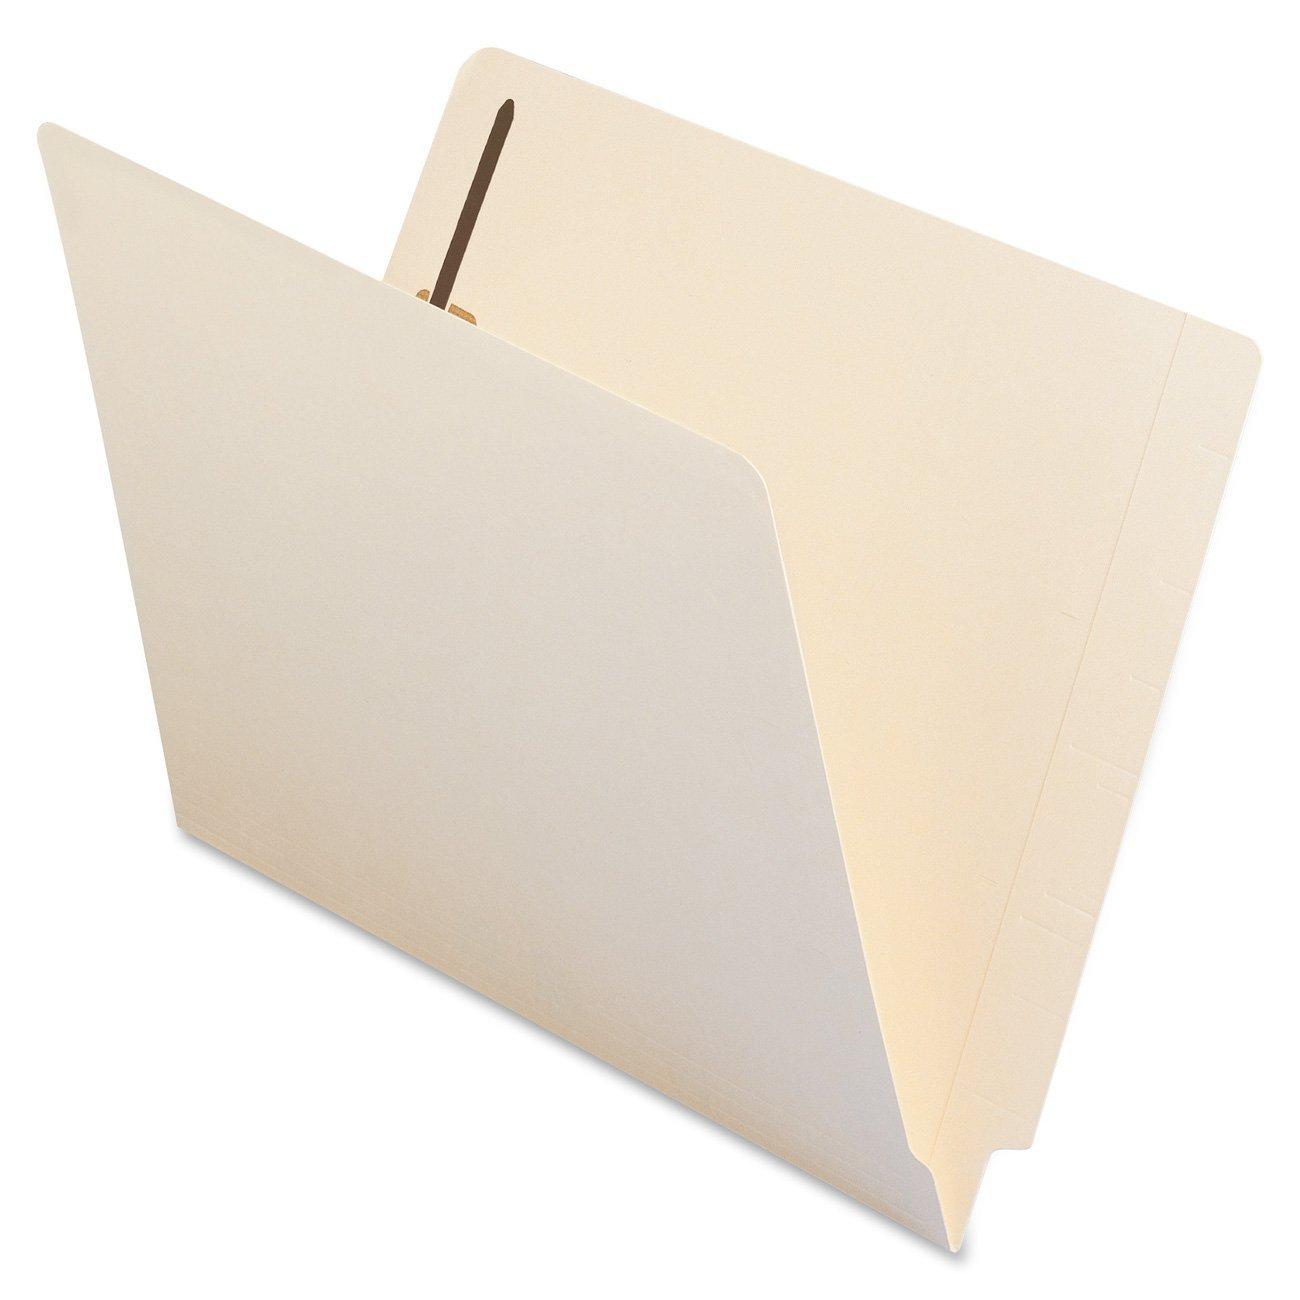 Smead File Folder, Shelf-Master Reinforced KbHnQ Straight-Cut Tab, 2 Fasteners 50 Count (4 Pack) weGpU